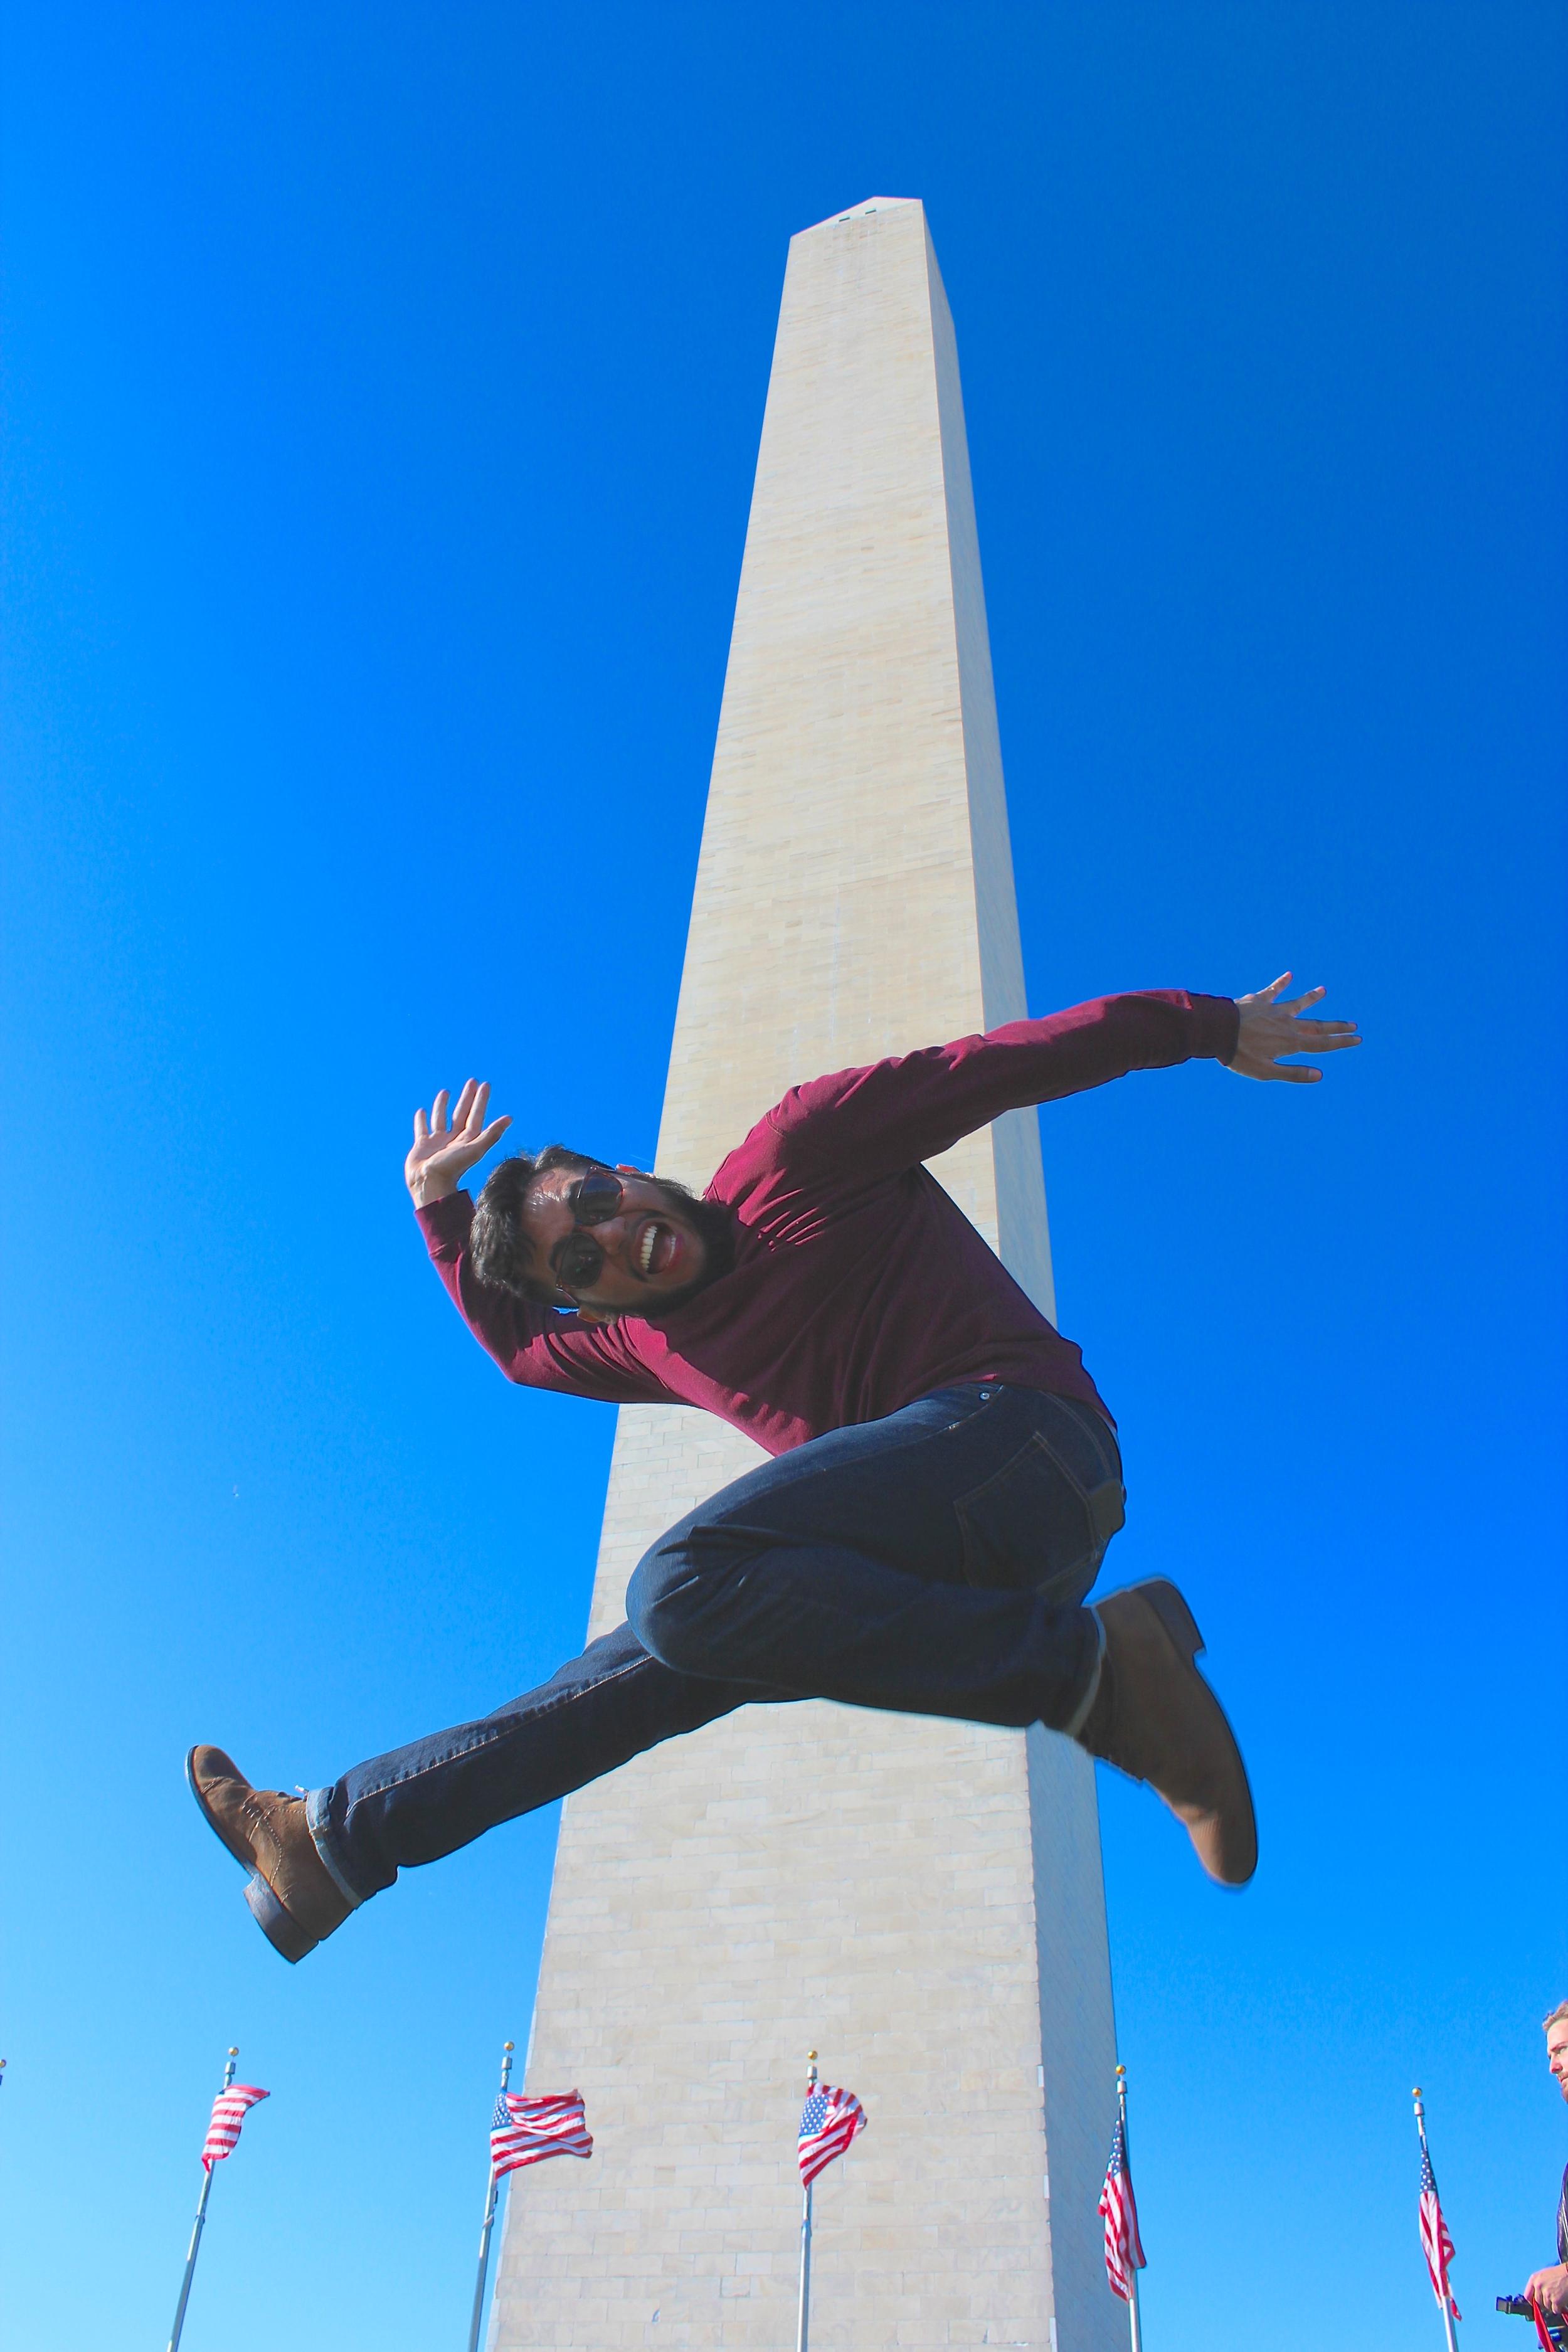 Luis & me at Washington Monument